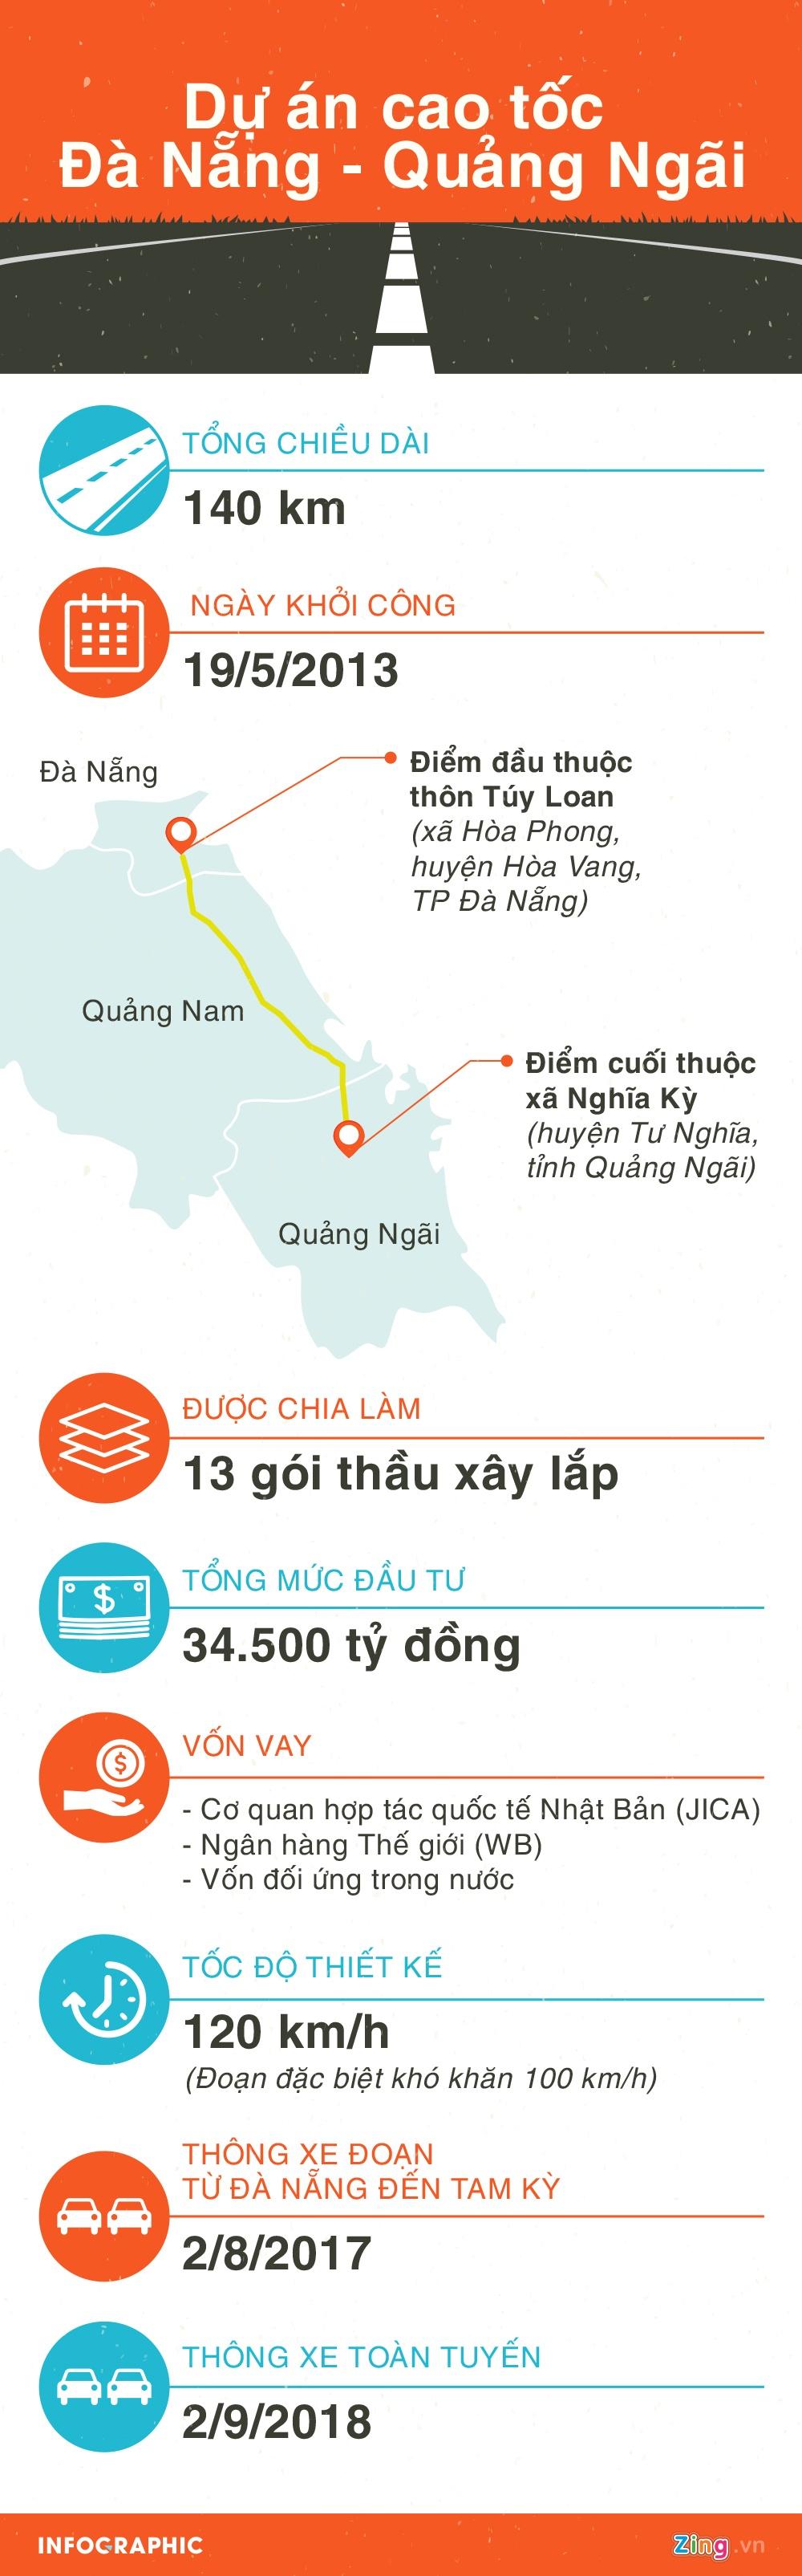 'Thanh tra Chinh phu se theo sat viec kiem tra cao toc 34.500 ty' hinh anh 3